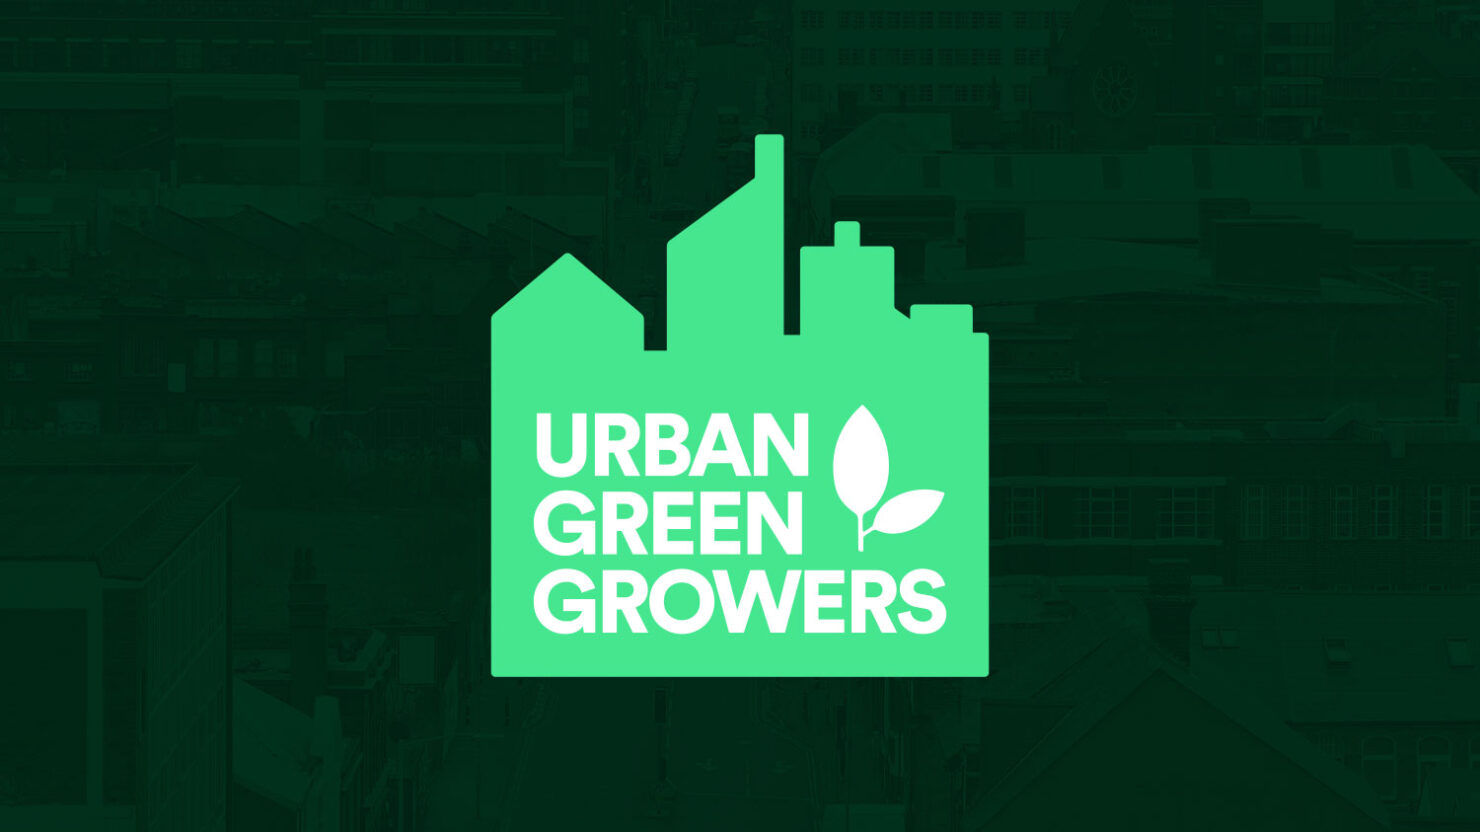 creative logo design for urban green growers solihull